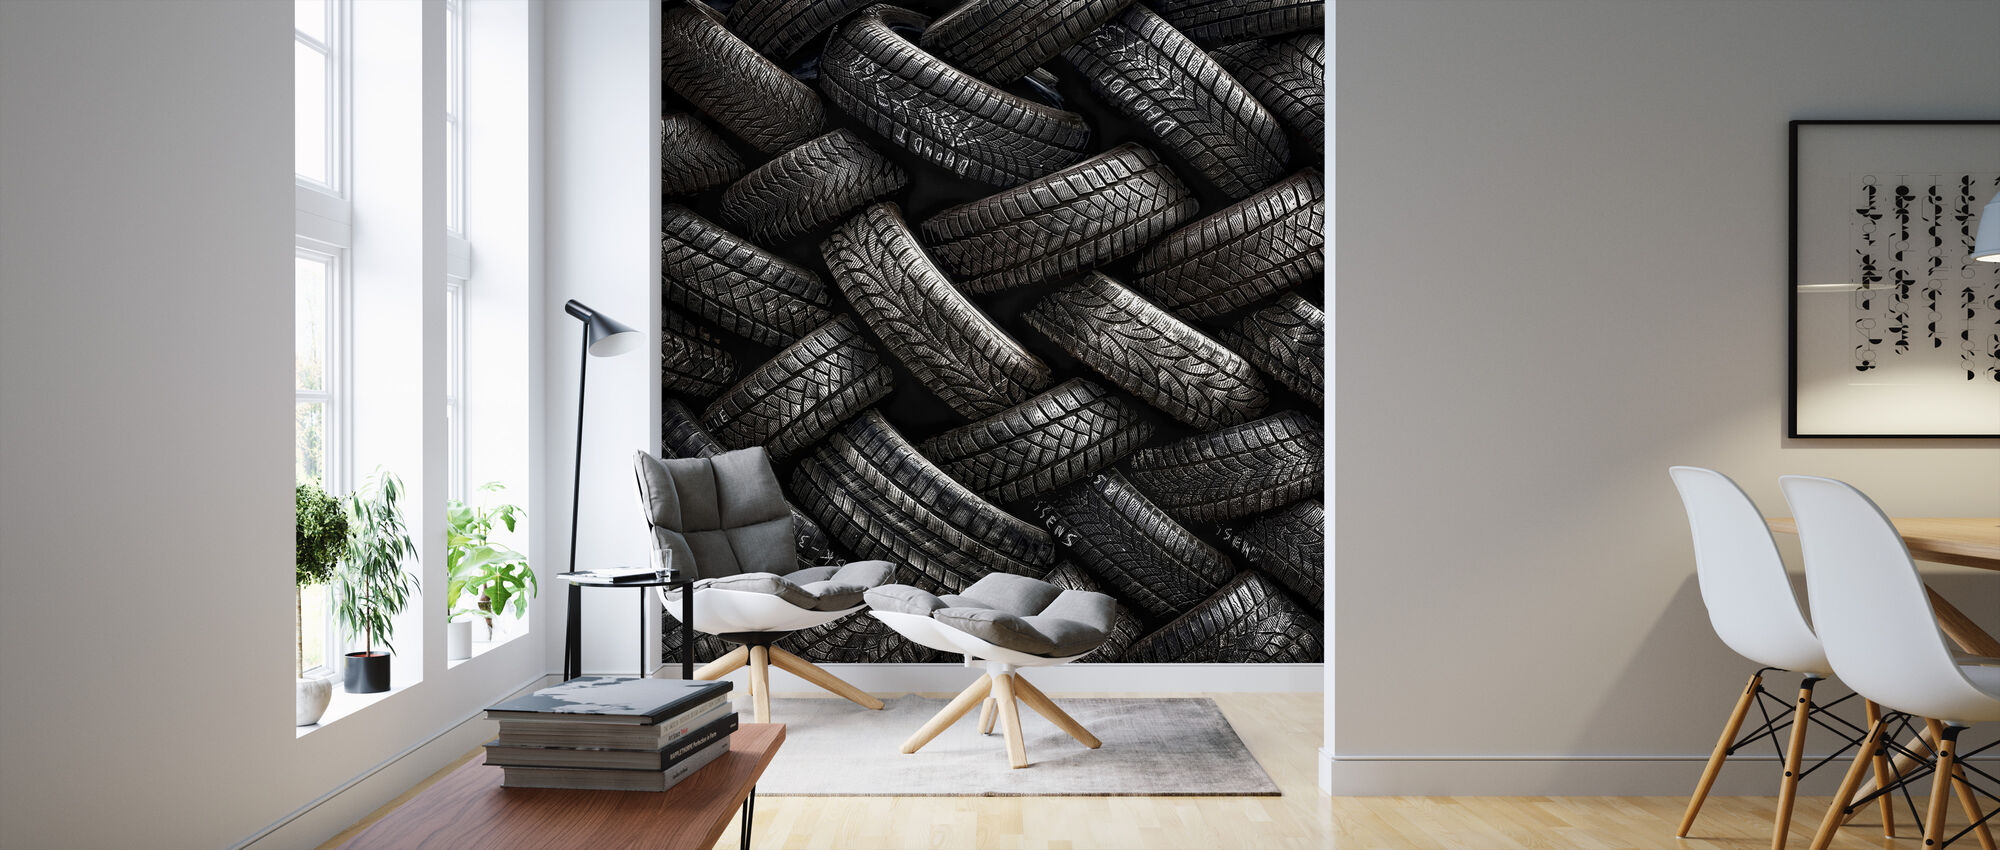 Tire tread trendy wall mural photowall - Tire tread wallpaper ...